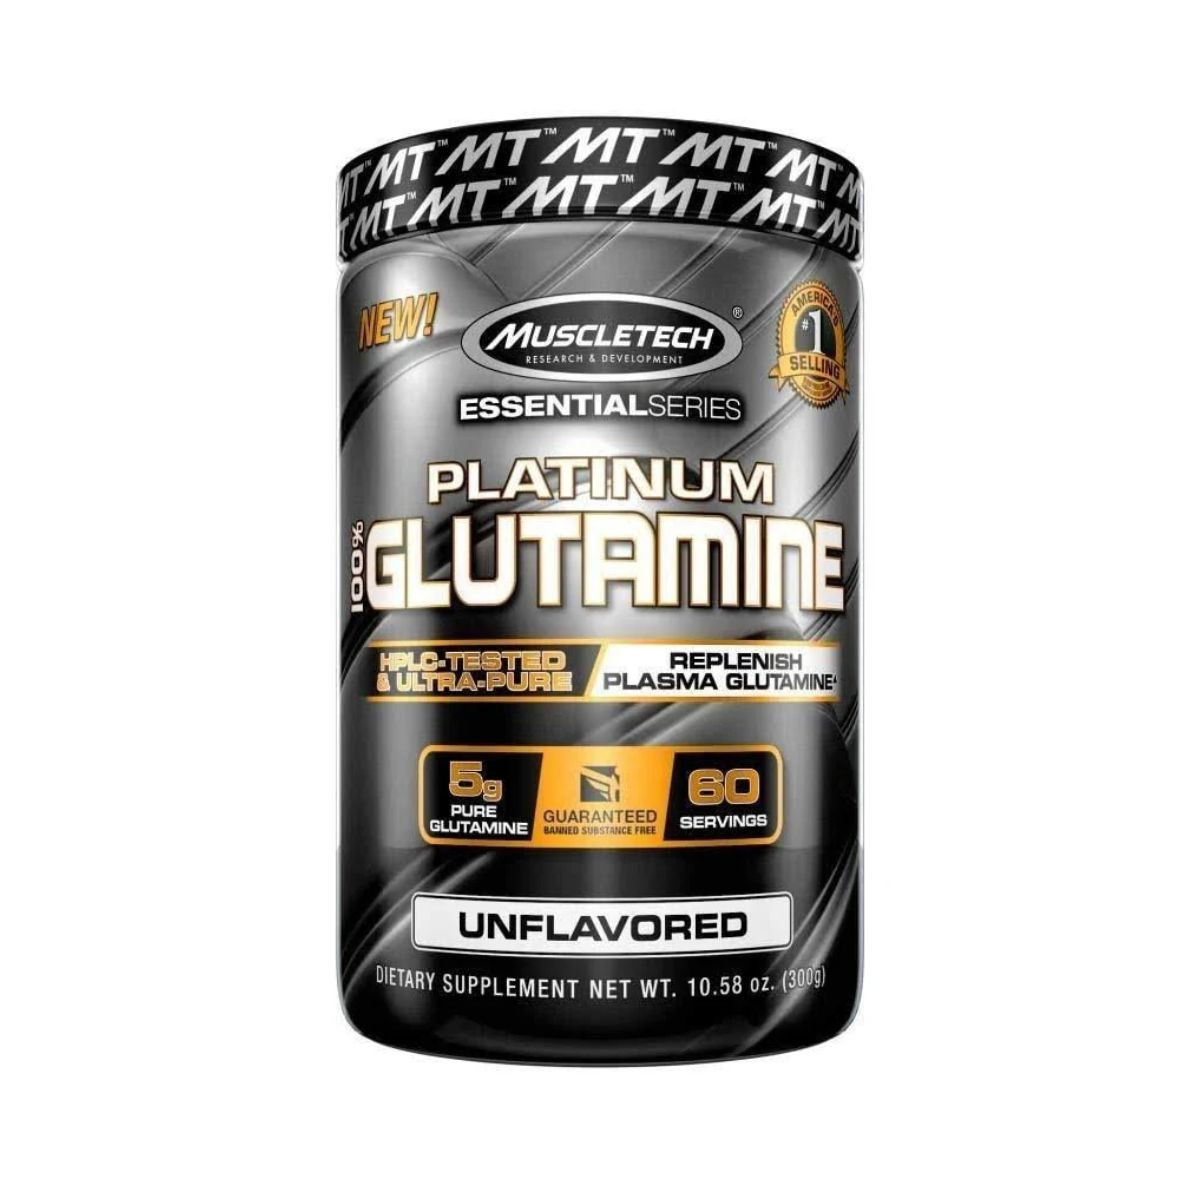 Platinum 100% Glutamina 300g - MuscleTech